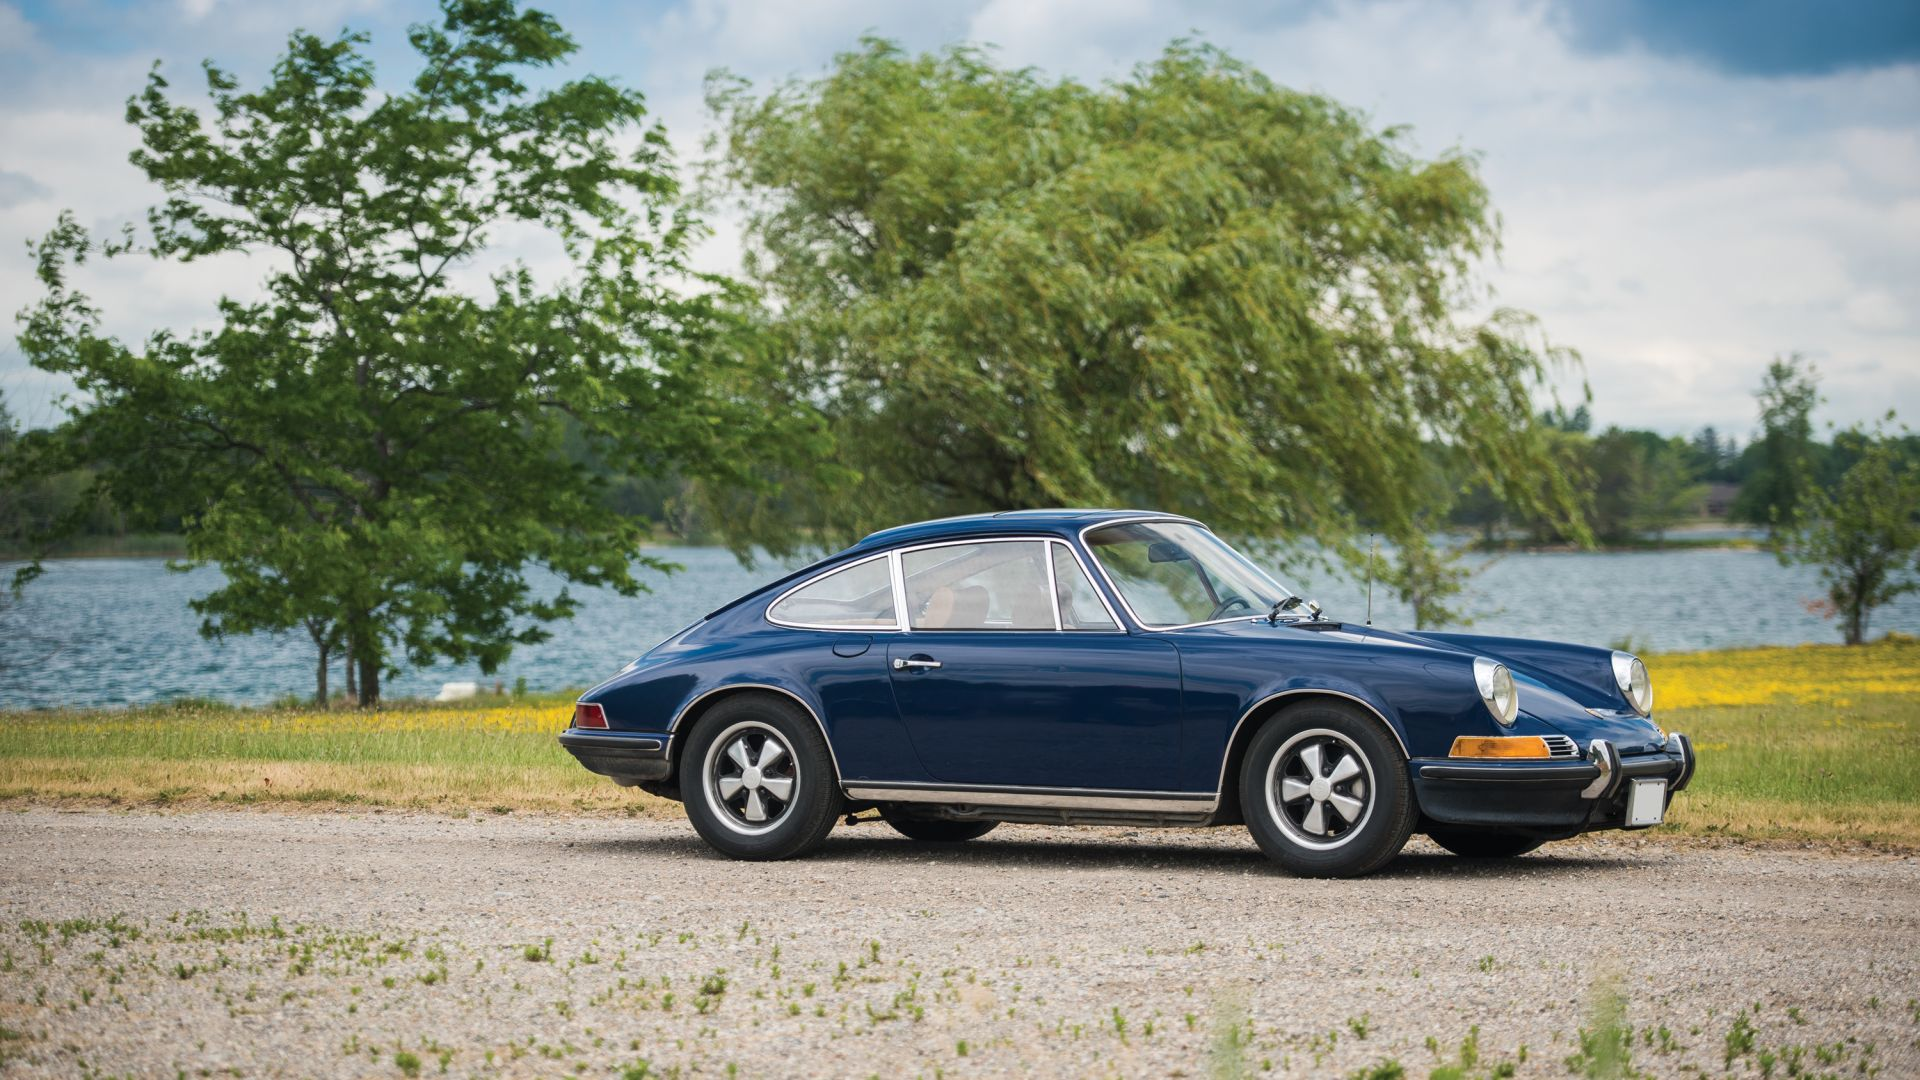 Porsche 911, Blue Classic Car Wallpaper